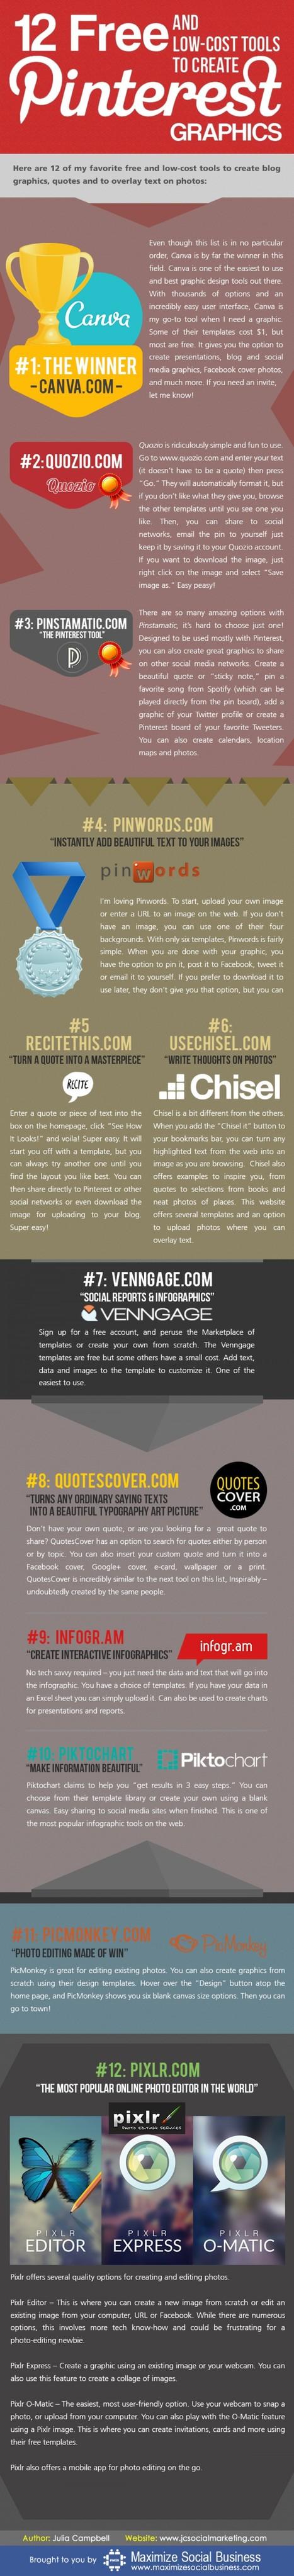 12 herramientas gratuitas para imágenes para Pinterest #infografia #infographic #socialmedia | Seo, Social Media Marketing | Scoop.it